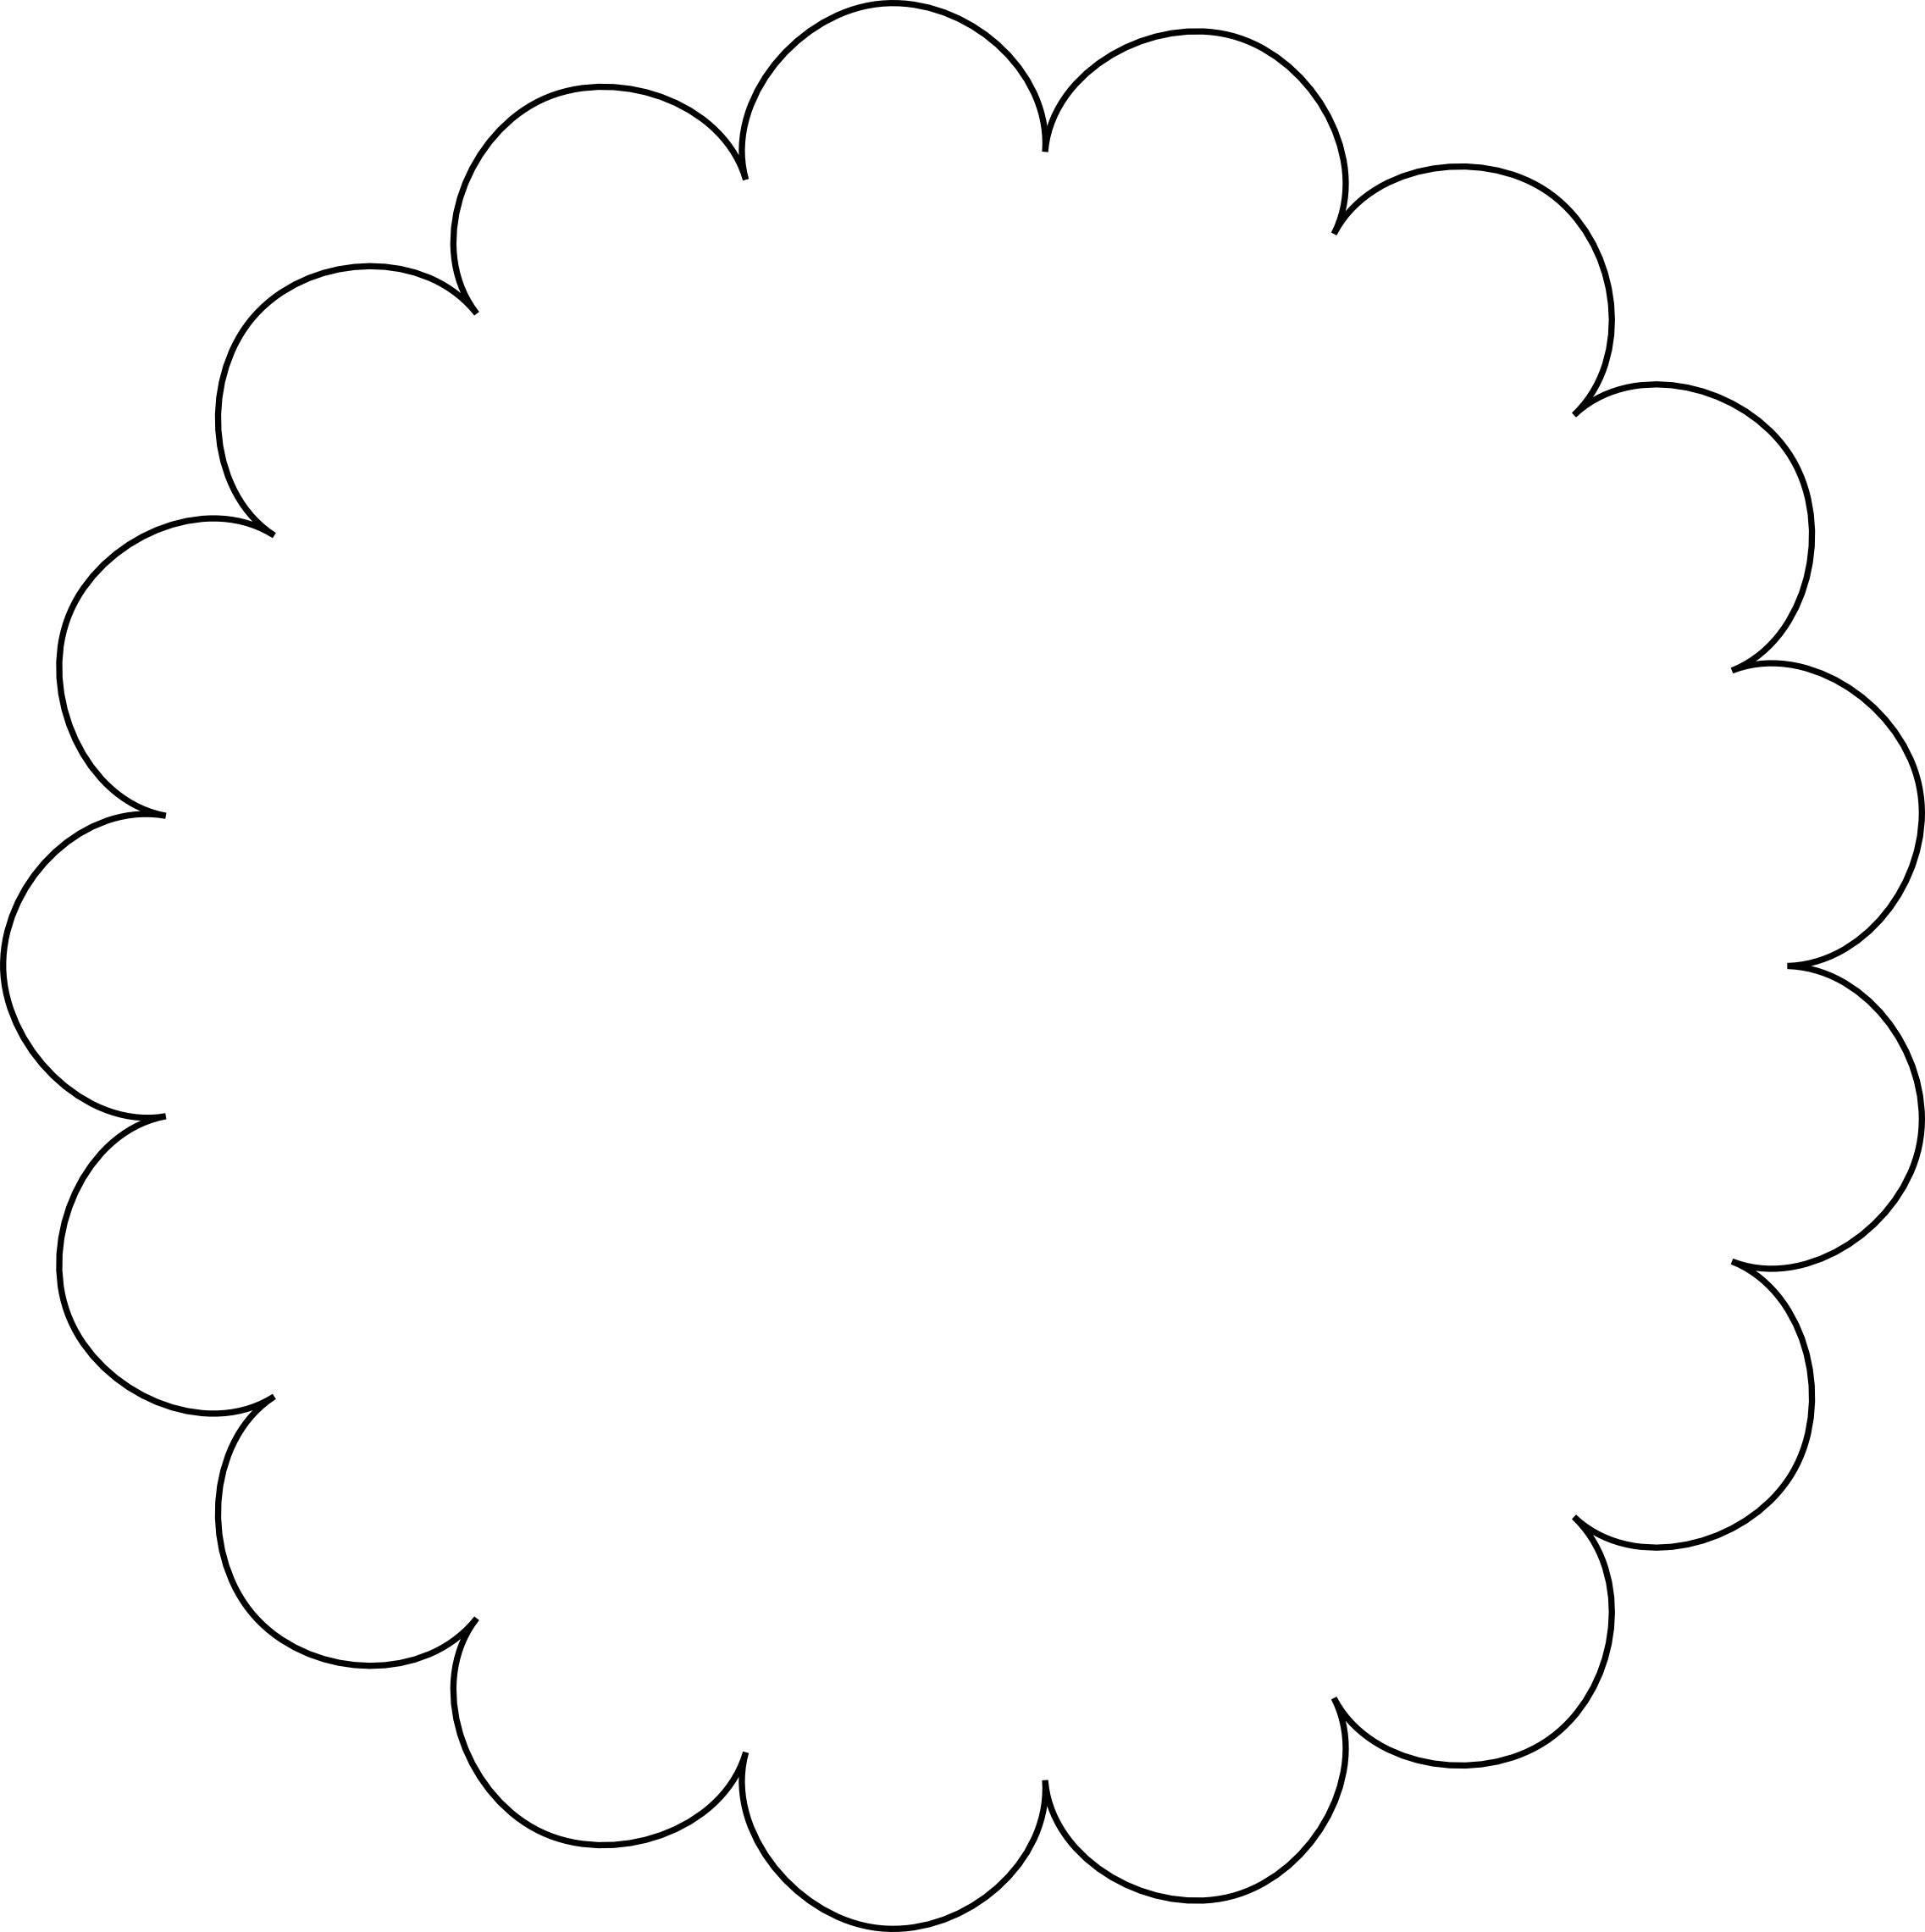 free clip art frame templates - photo #40